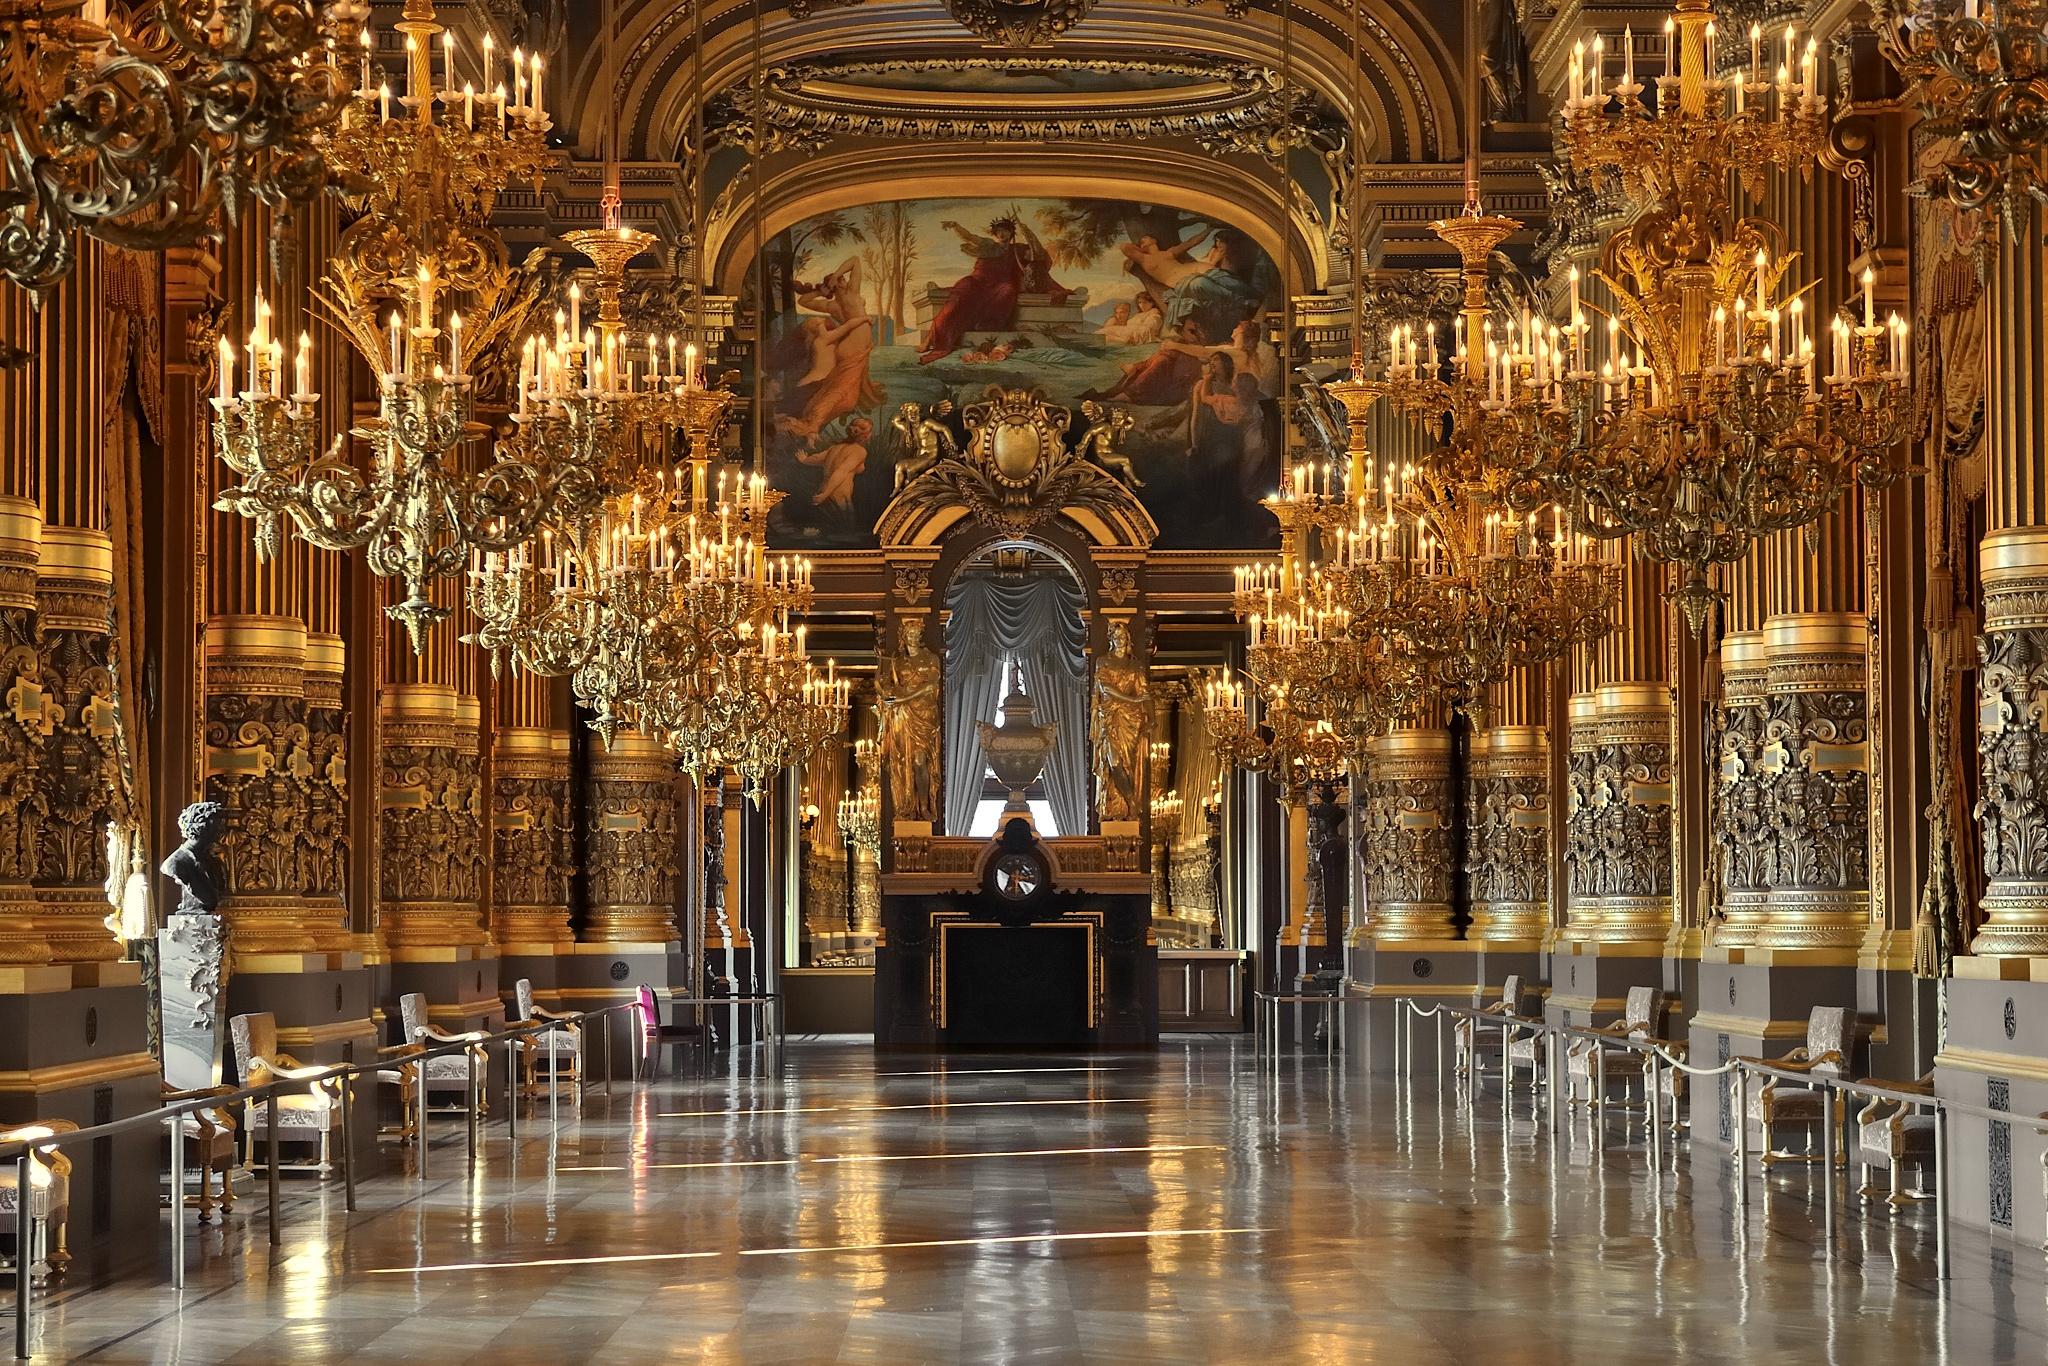 file palais garnier 39 s grand salon 12 february wikimedia commons. Black Bedroom Furniture Sets. Home Design Ideas